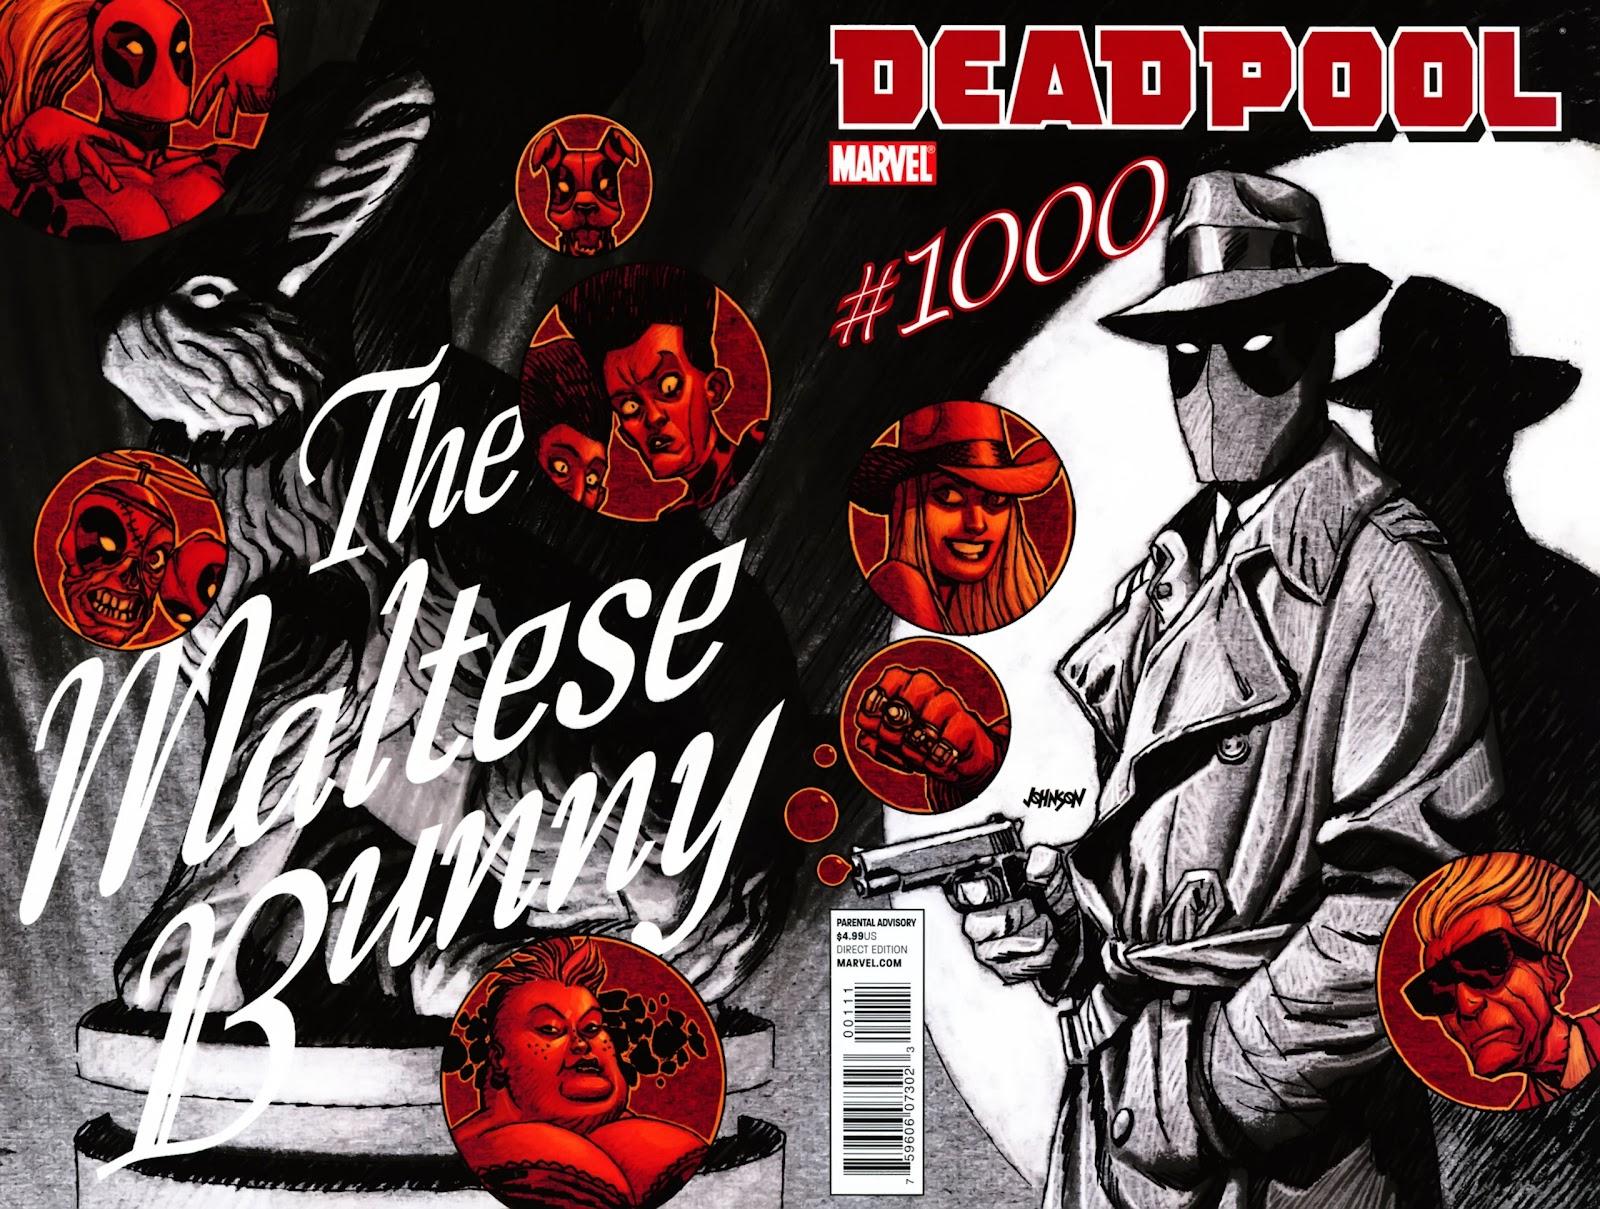 Read online Deadpool (2008) comic -  Issue #1000 - 1